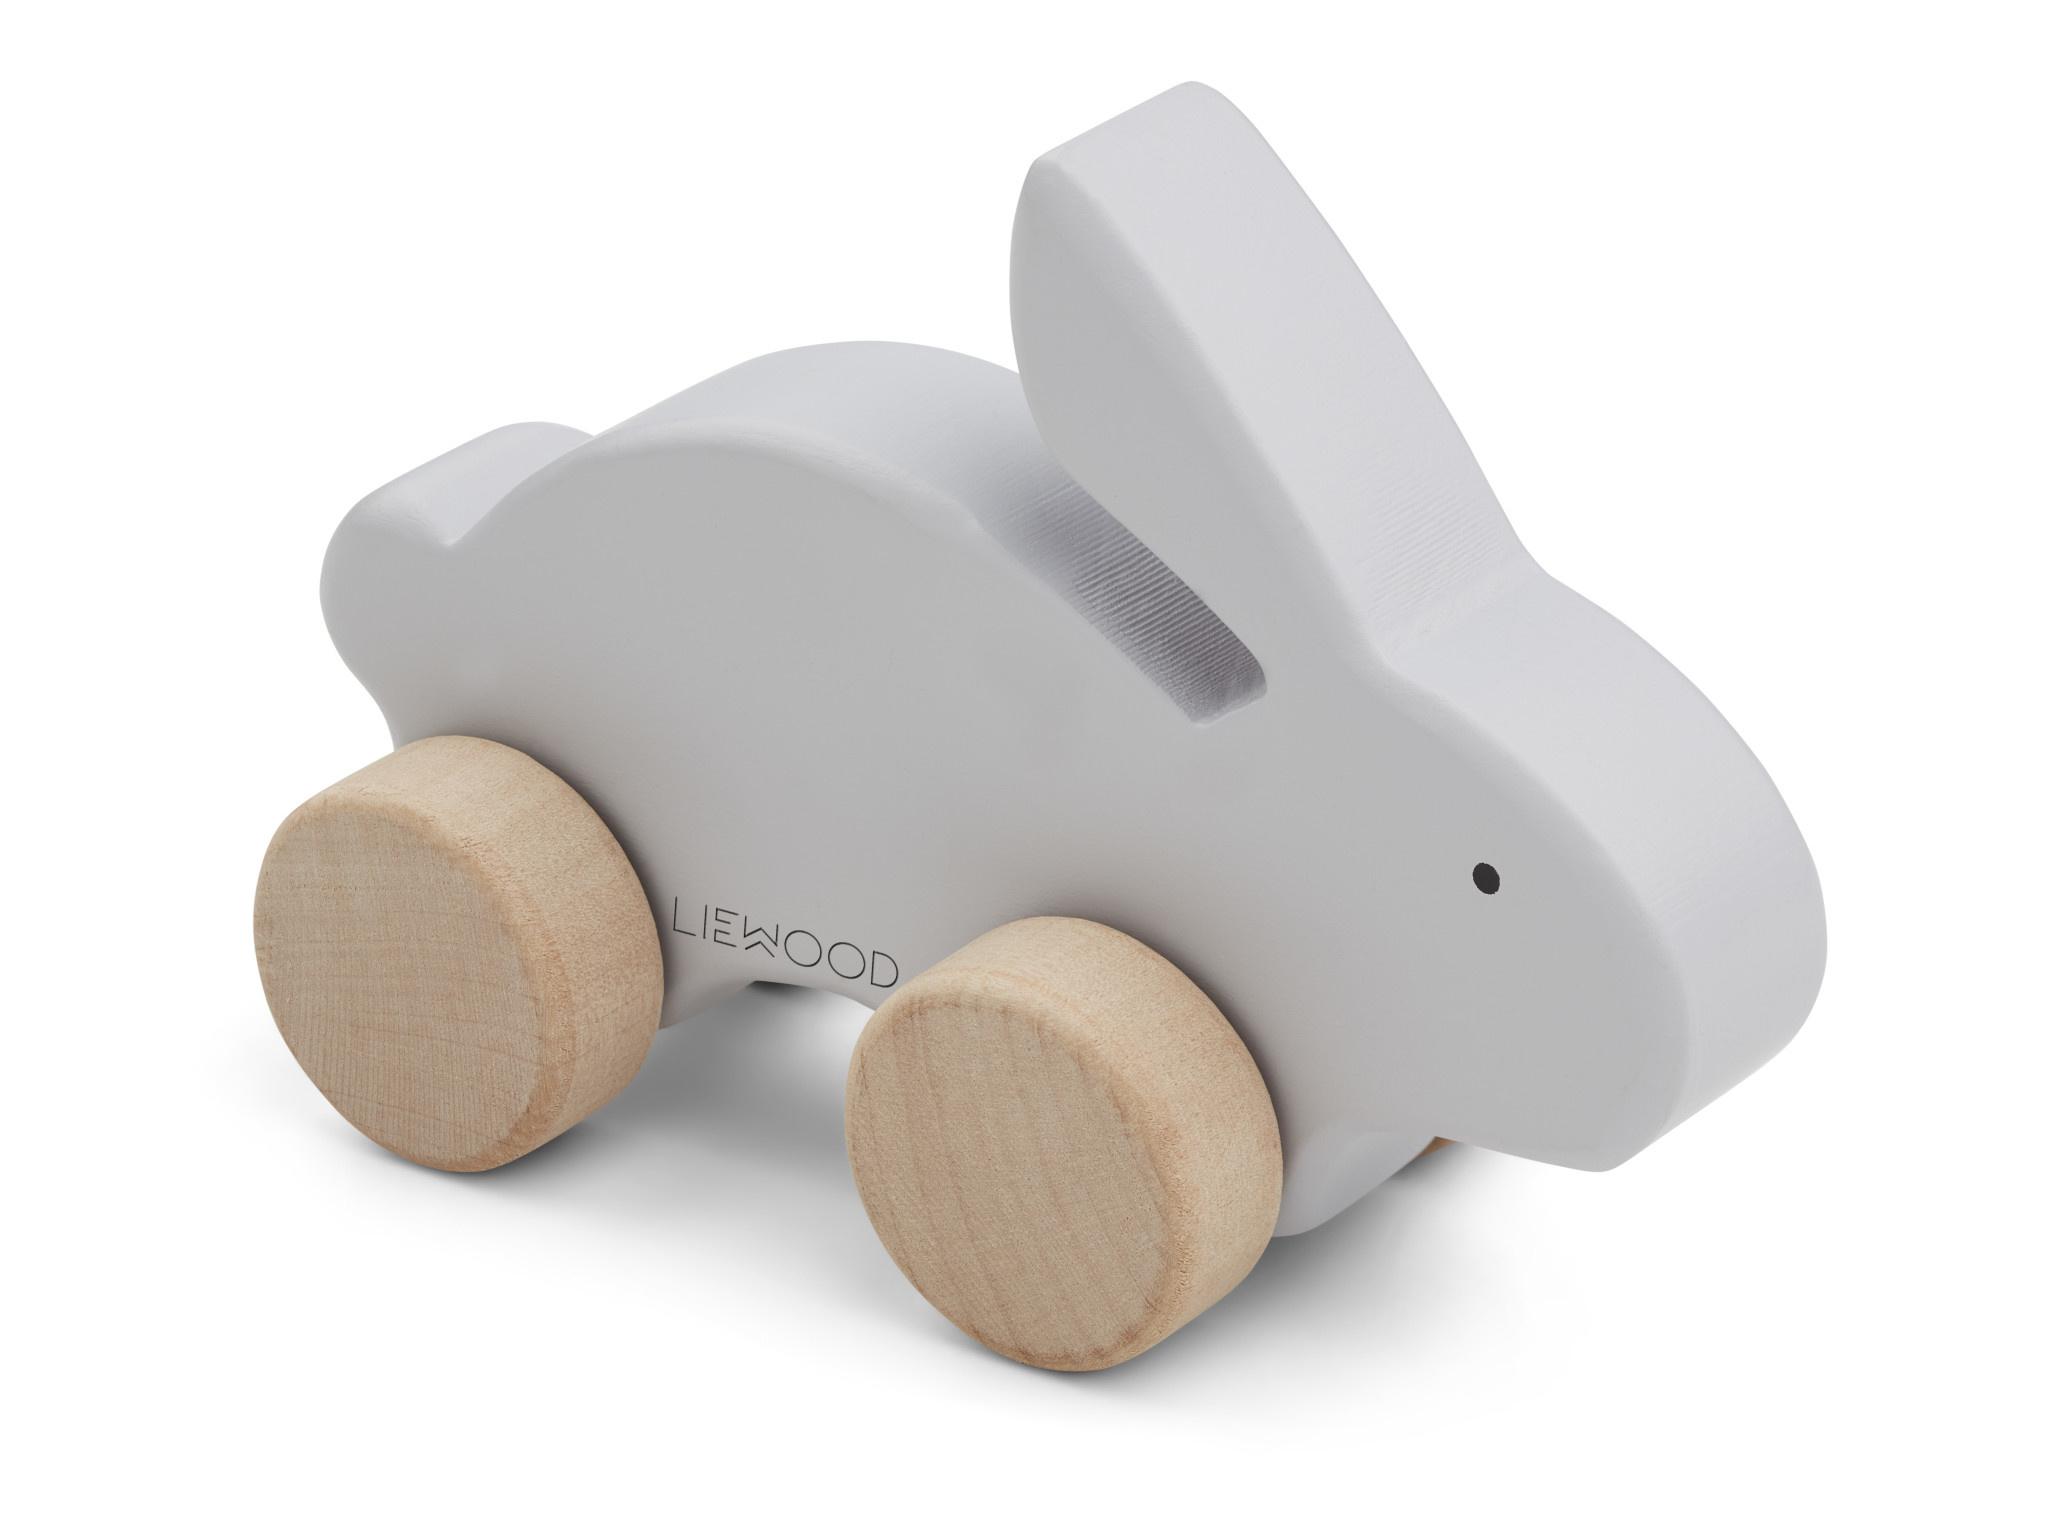 Elena wood toy rabbit dumbo grey-1